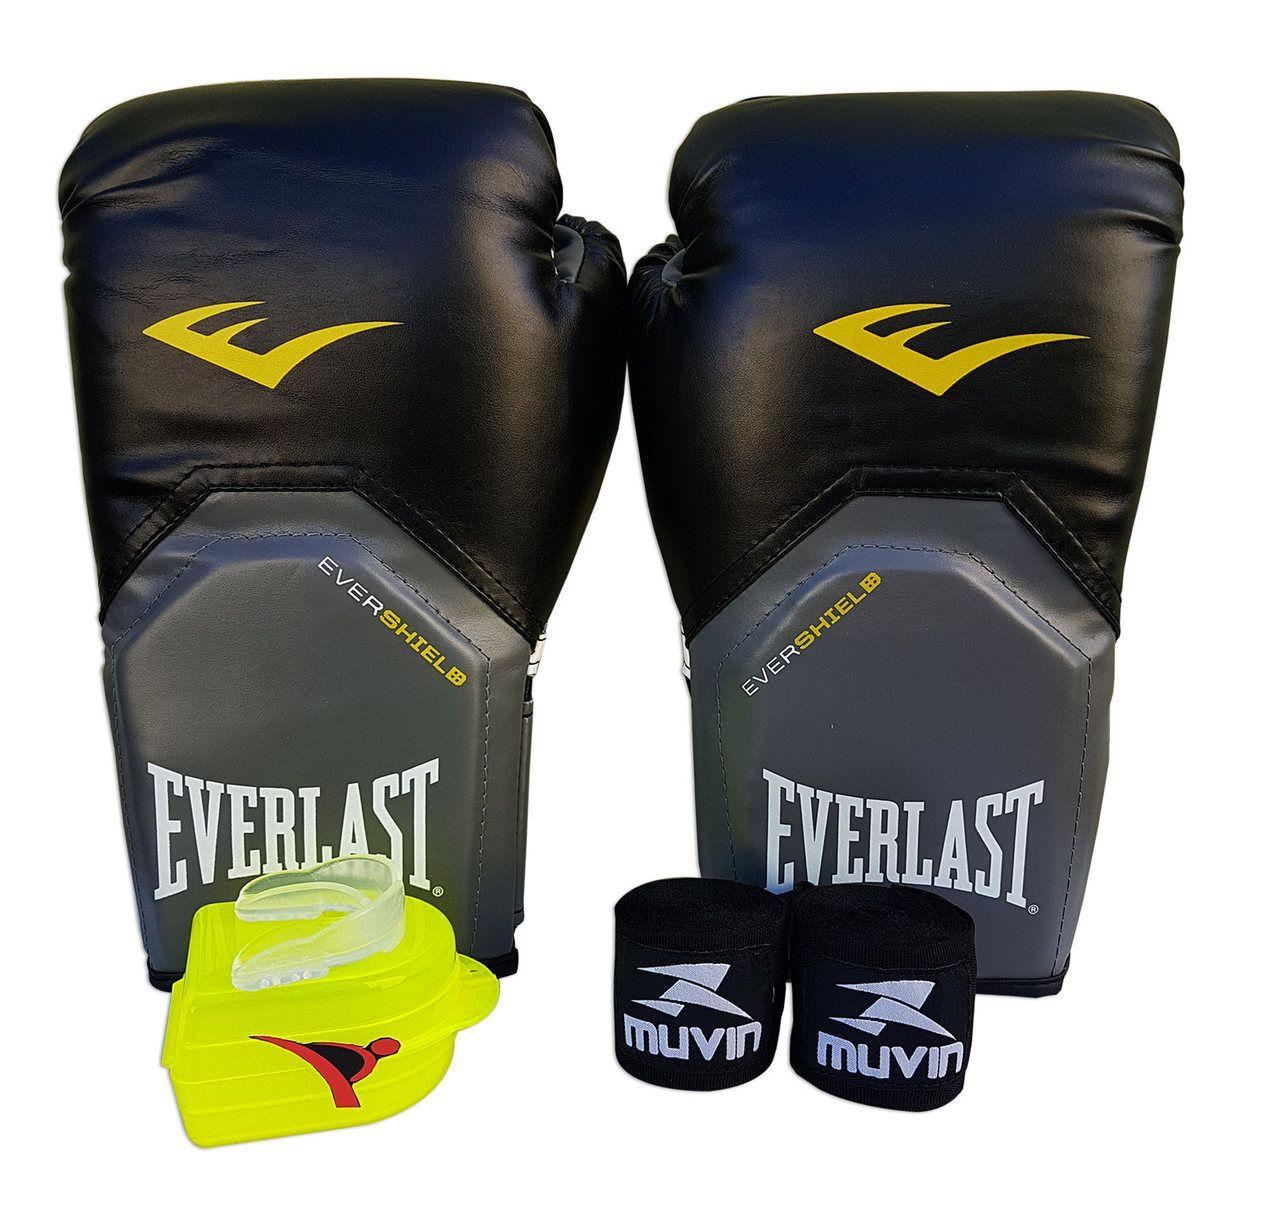 6a257b757 Kit de Boxe   Muay Thai 12oz - Preto - Pro Style - Everlast - PRALUTA ...